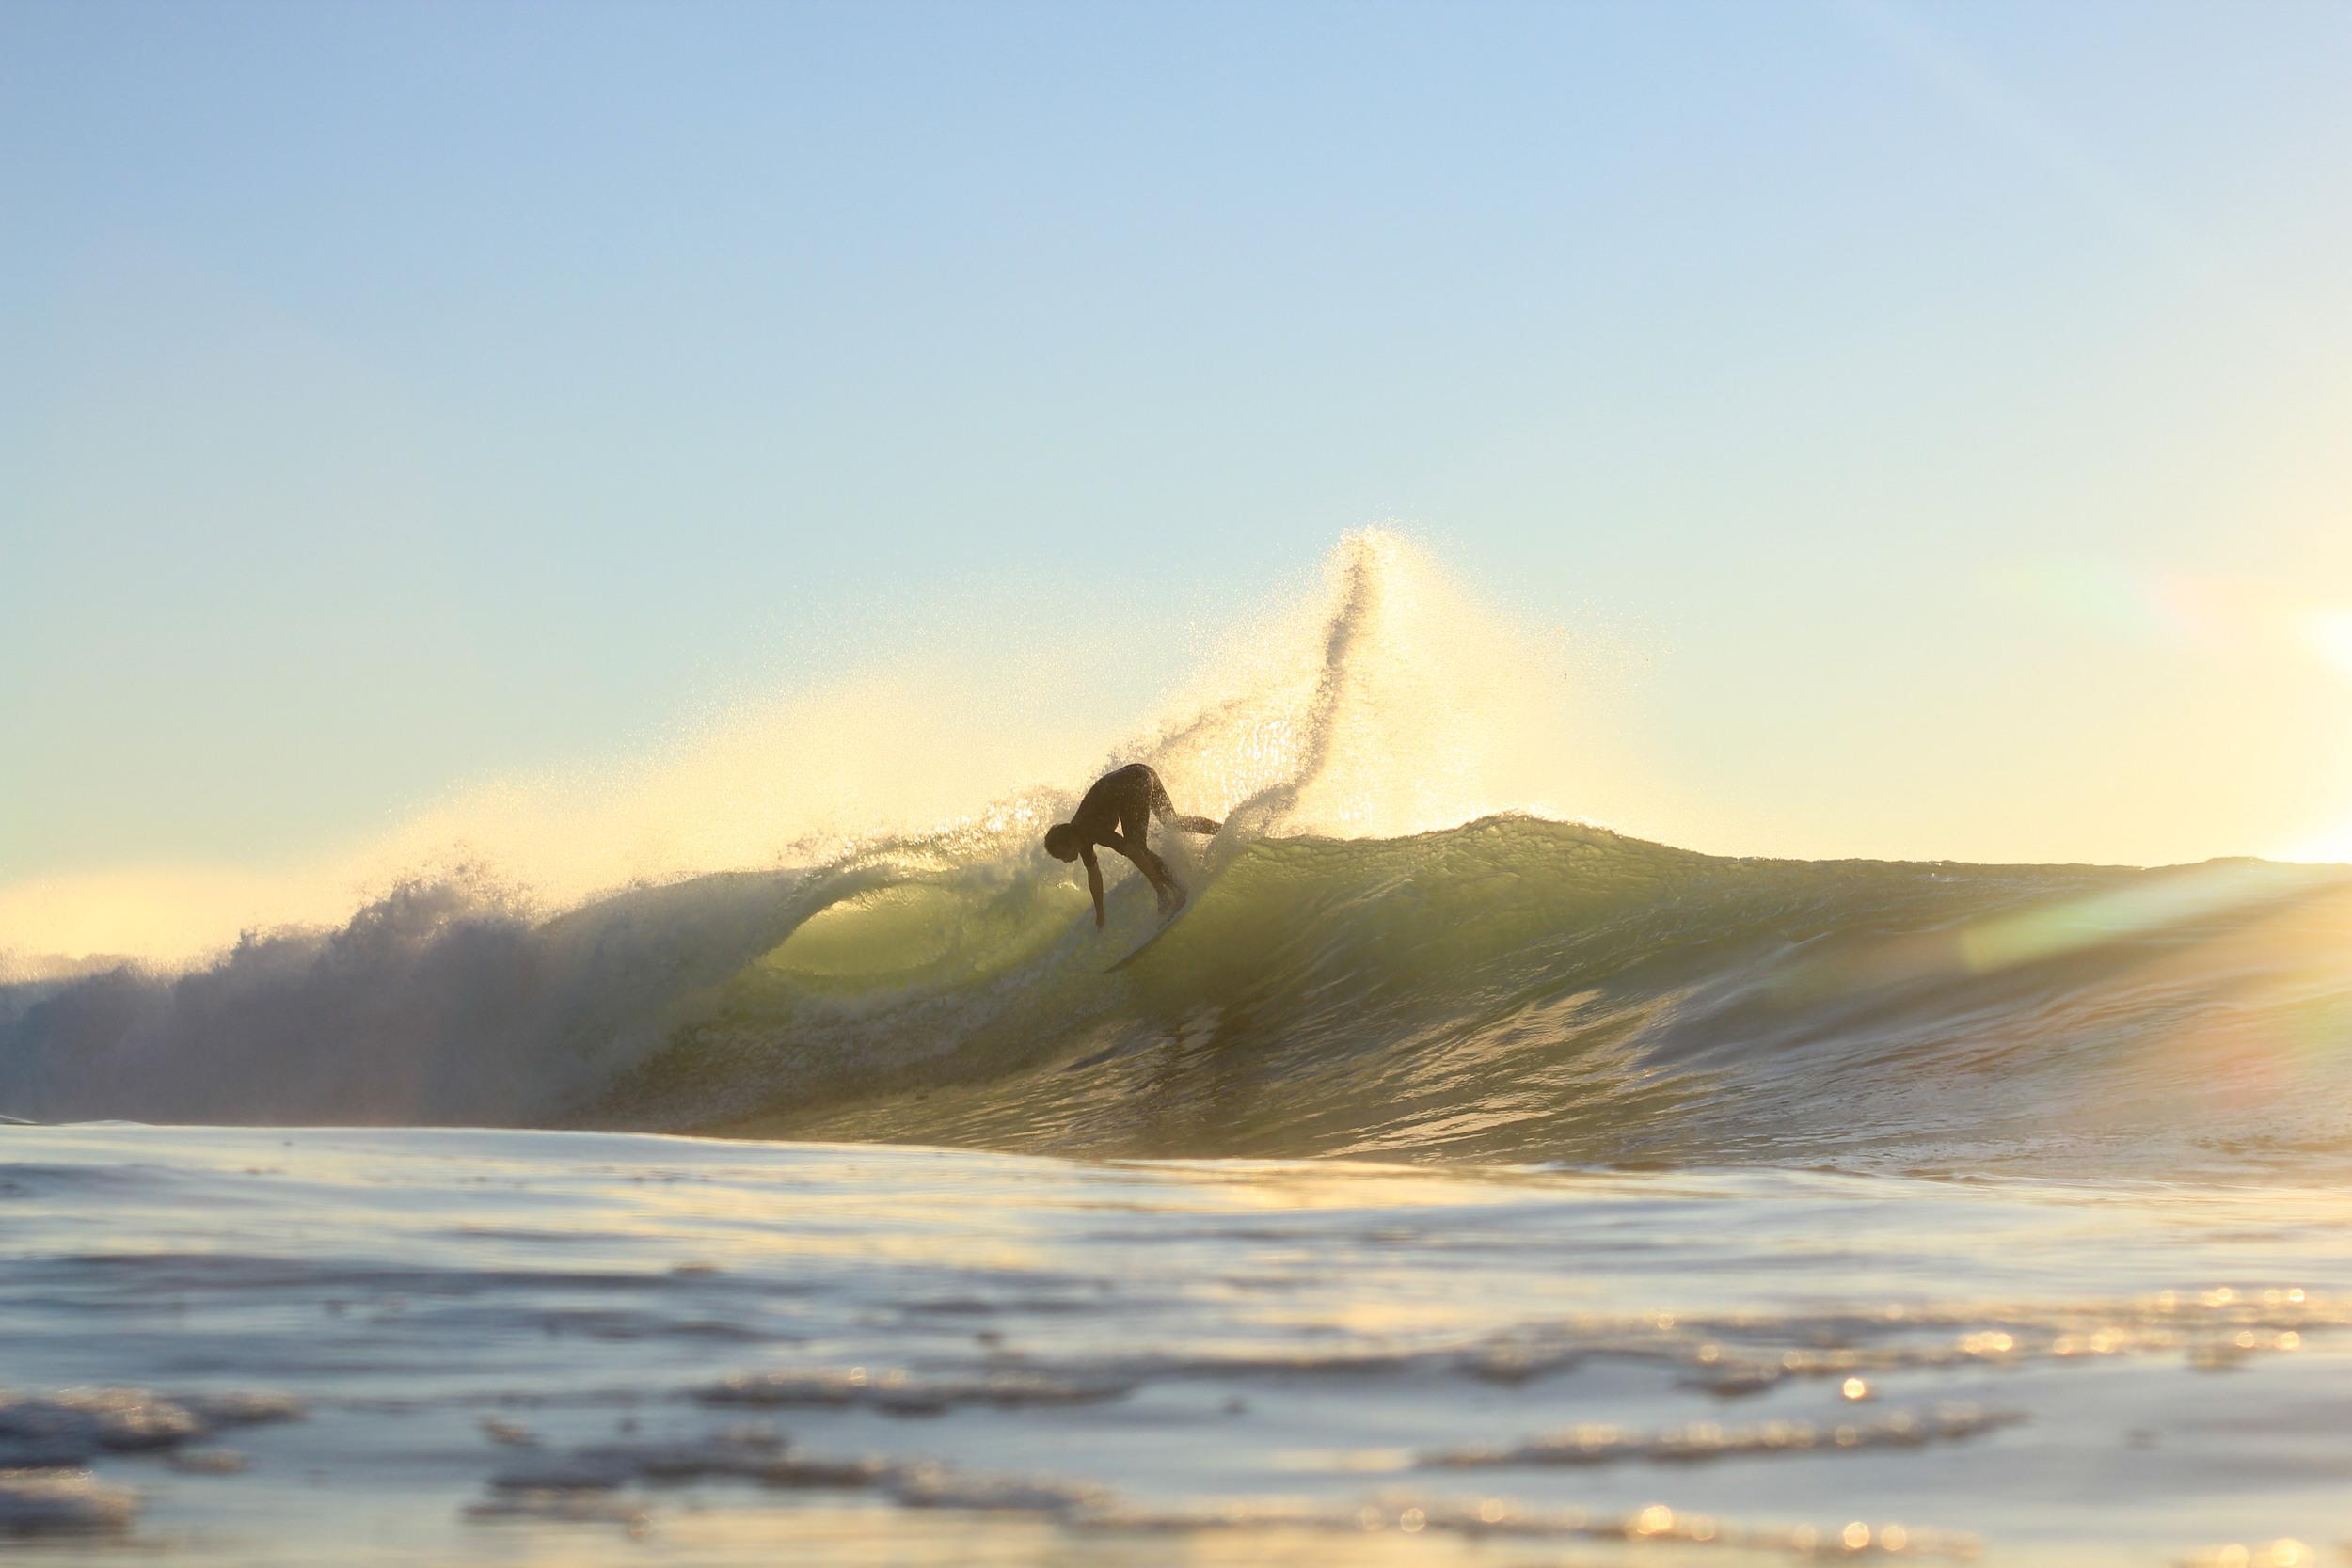 Surfer Dustin Hollick @dustohollick on a sketchy morning swim out at Northwall Ballina last year. Photo: Angie Davis @angelahelendavis